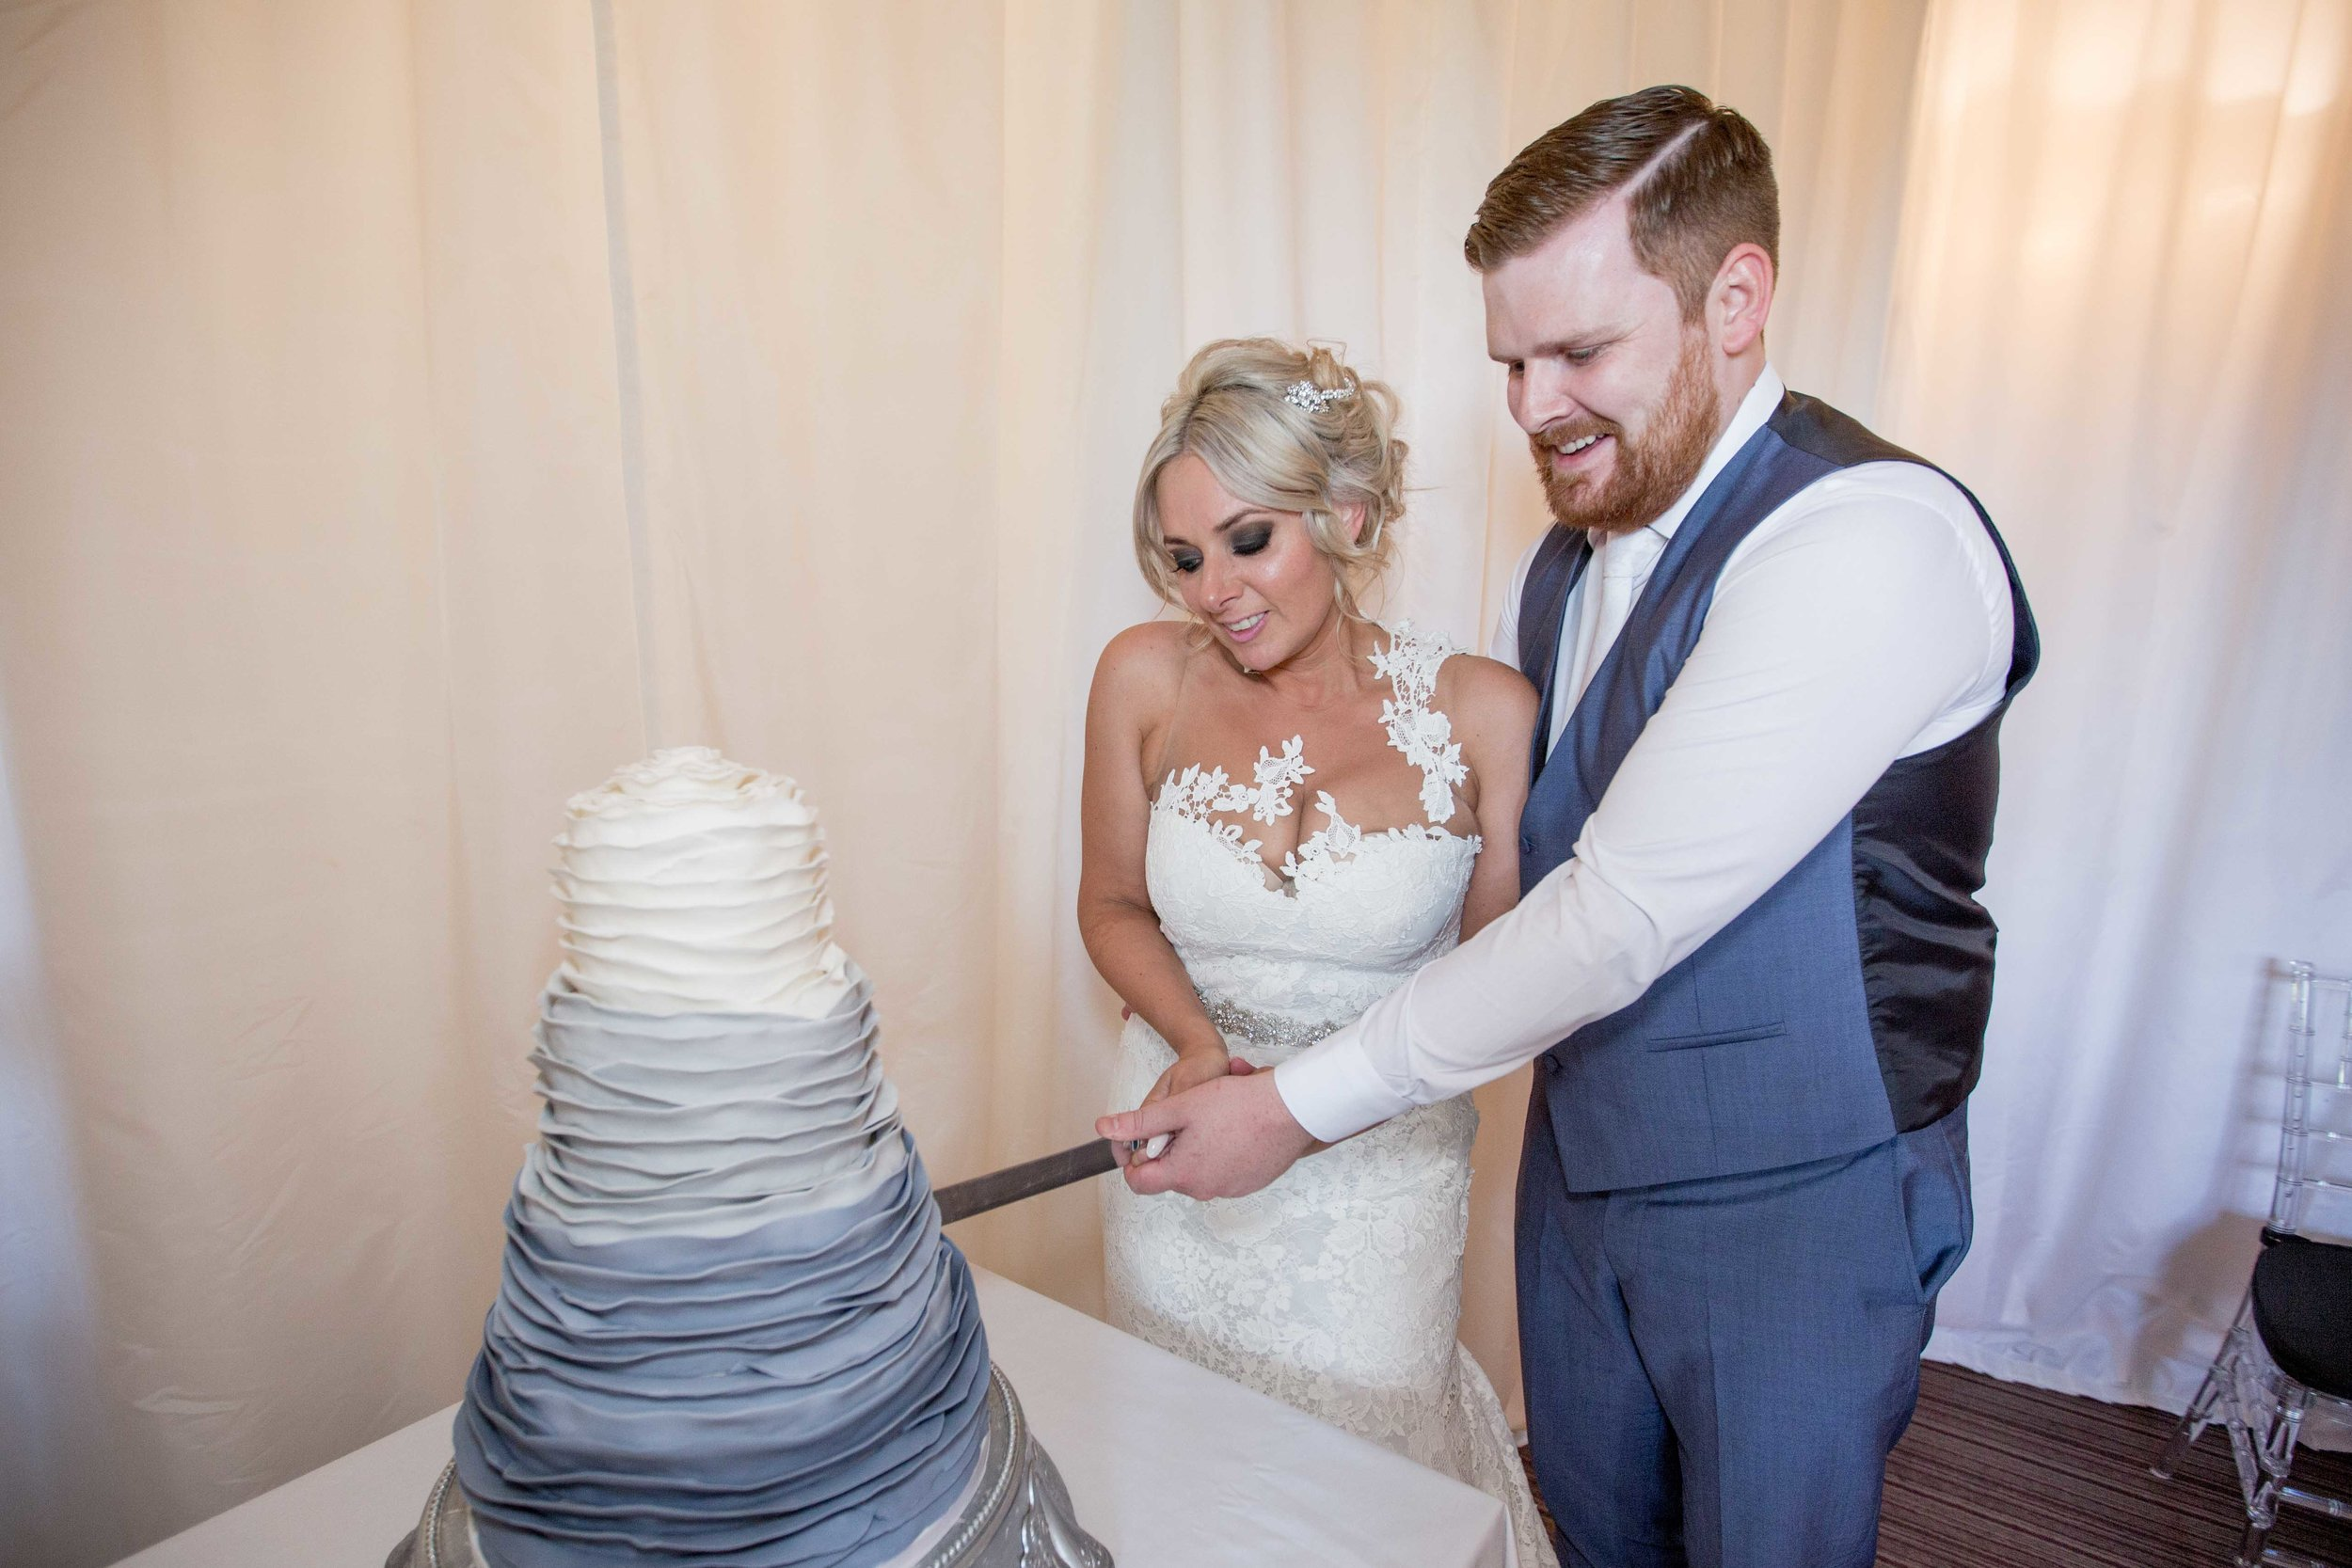 cotswold-wedding-photography-at-stonehouse-court-hotel-natalia-smith-photography-gloucestershire-wedding-photographer-87.jpg